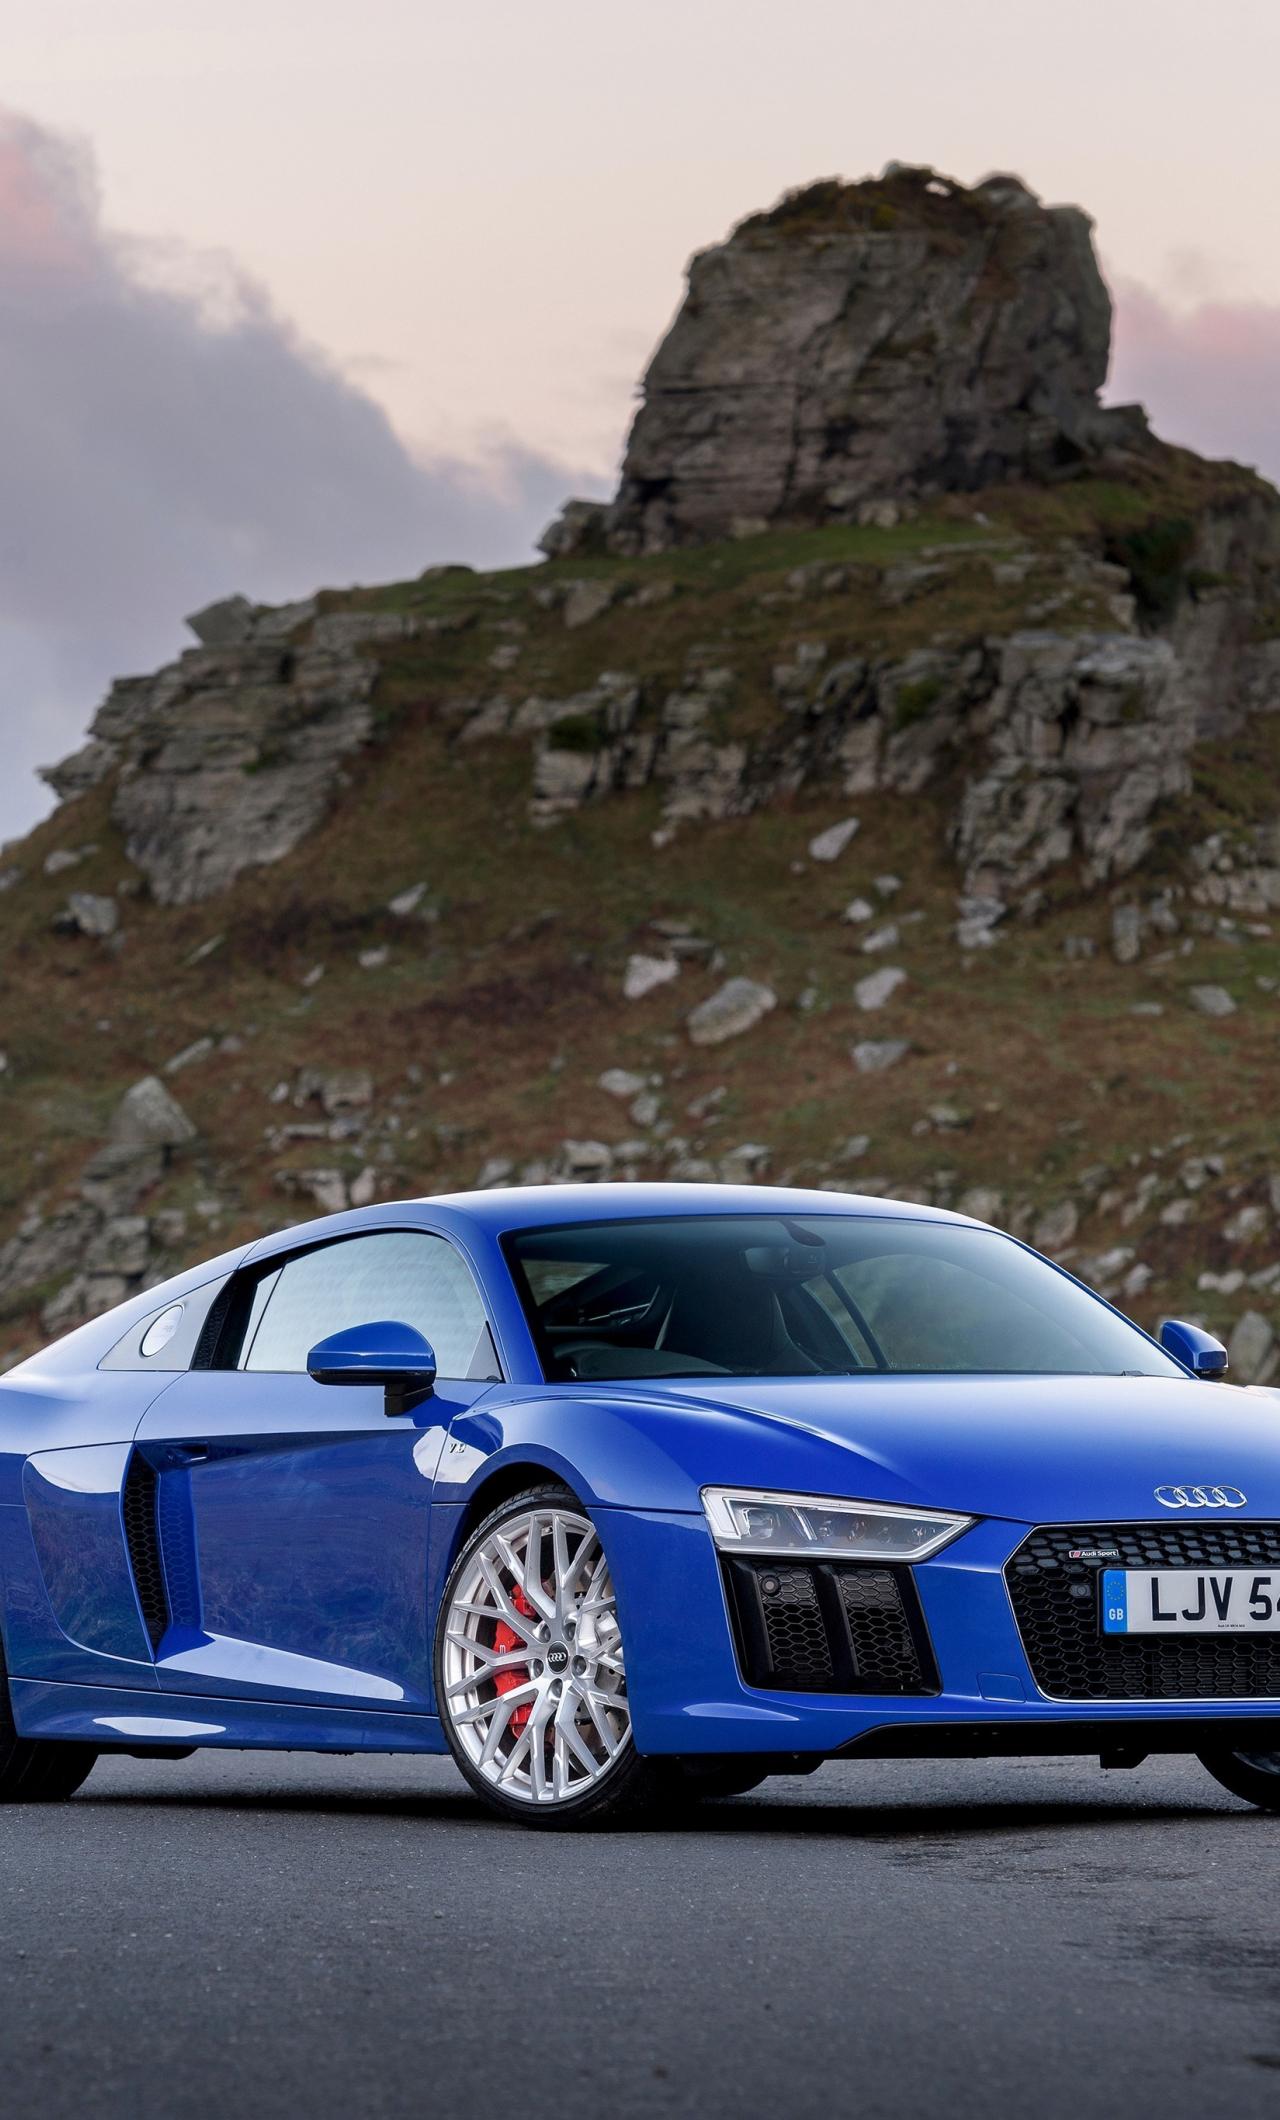 Download 1280x2120 Wallpaper 2018 Audi R8 V10 Blue Car Front